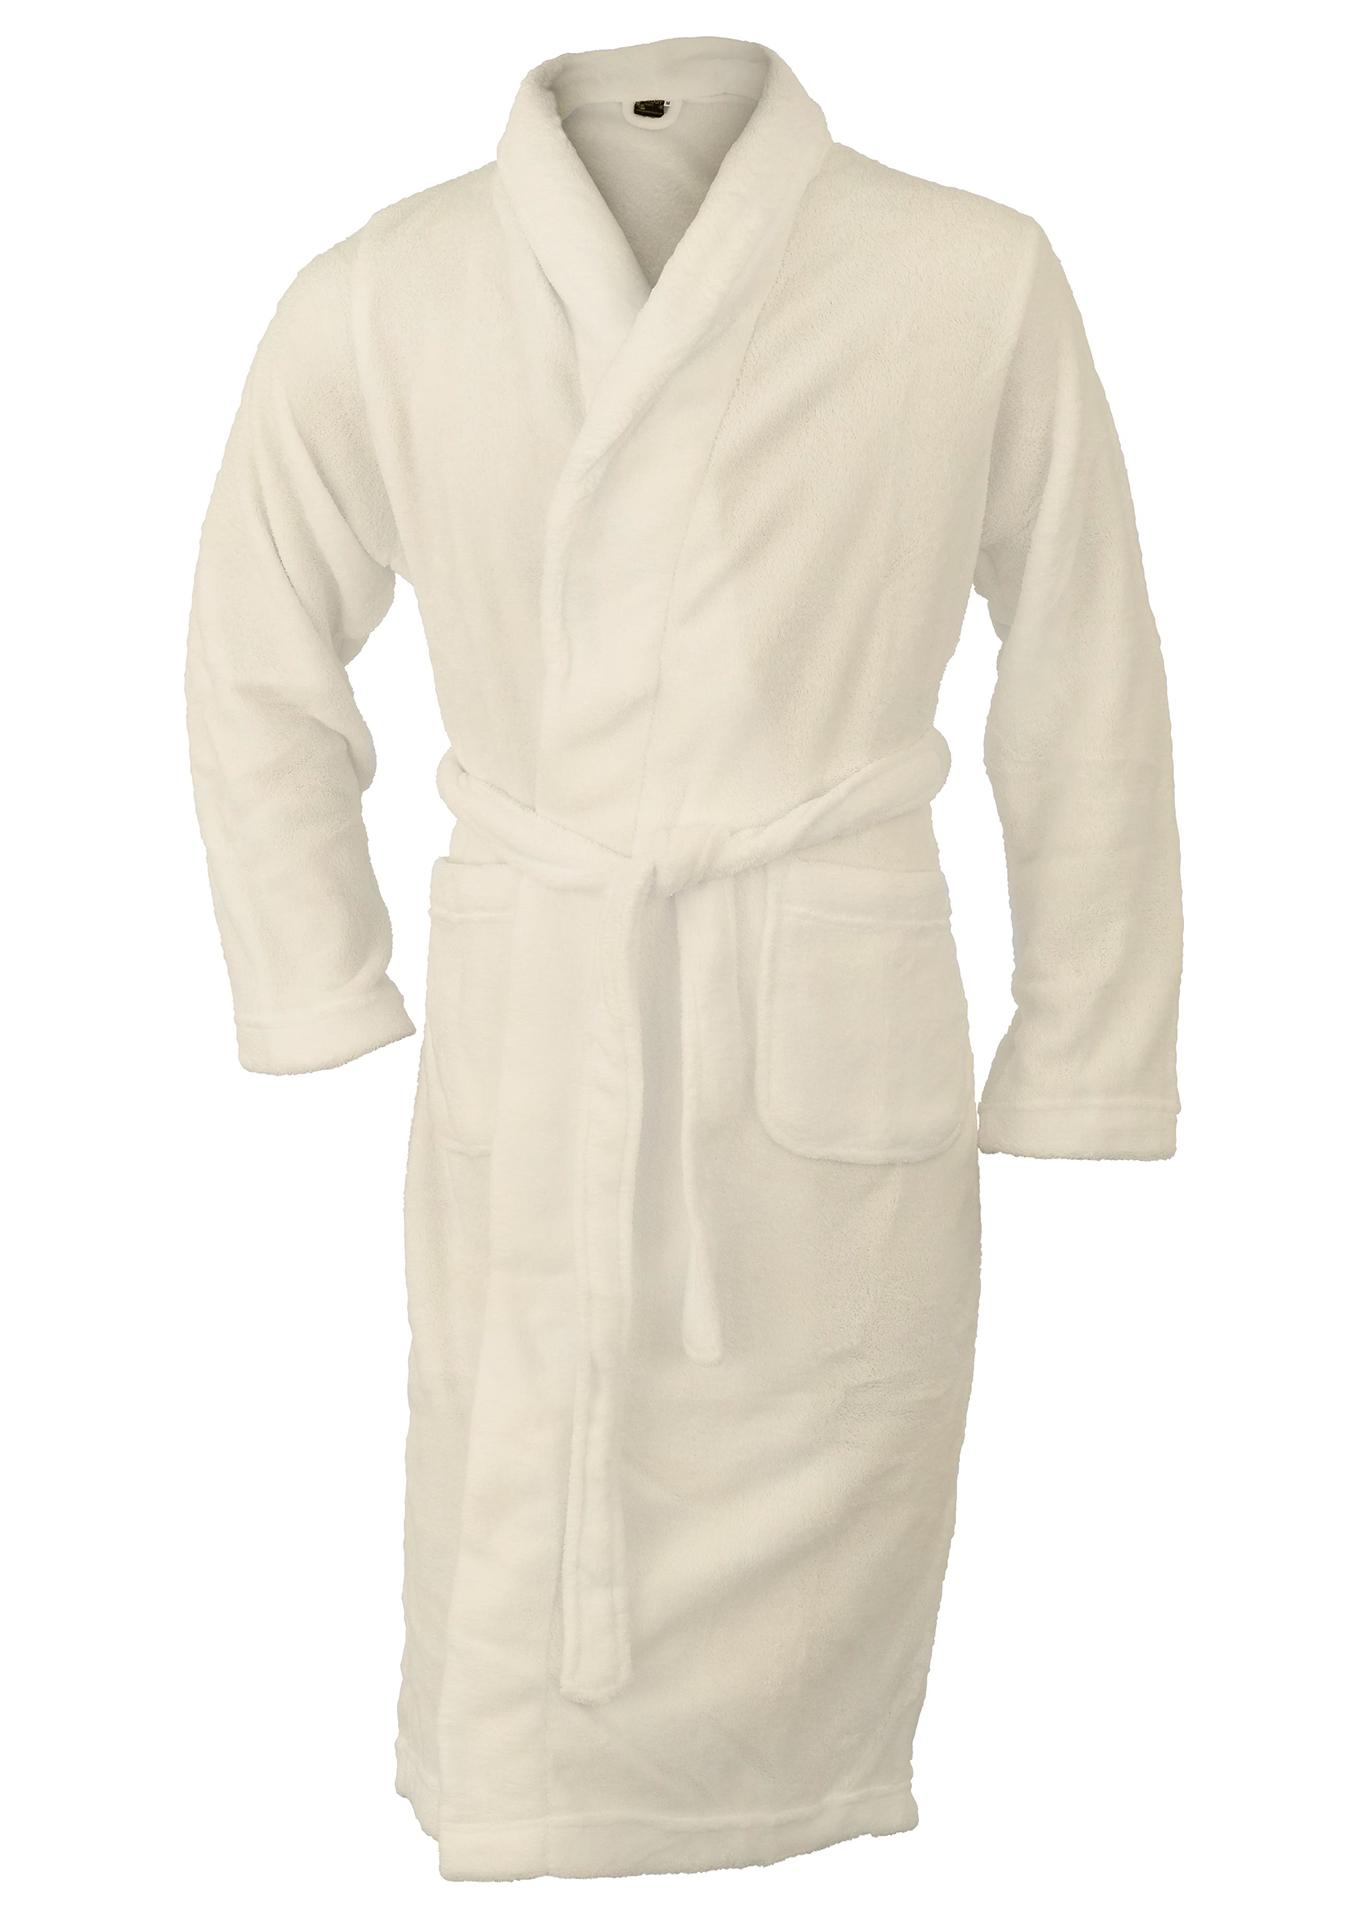 Bath Robes Comfort cream